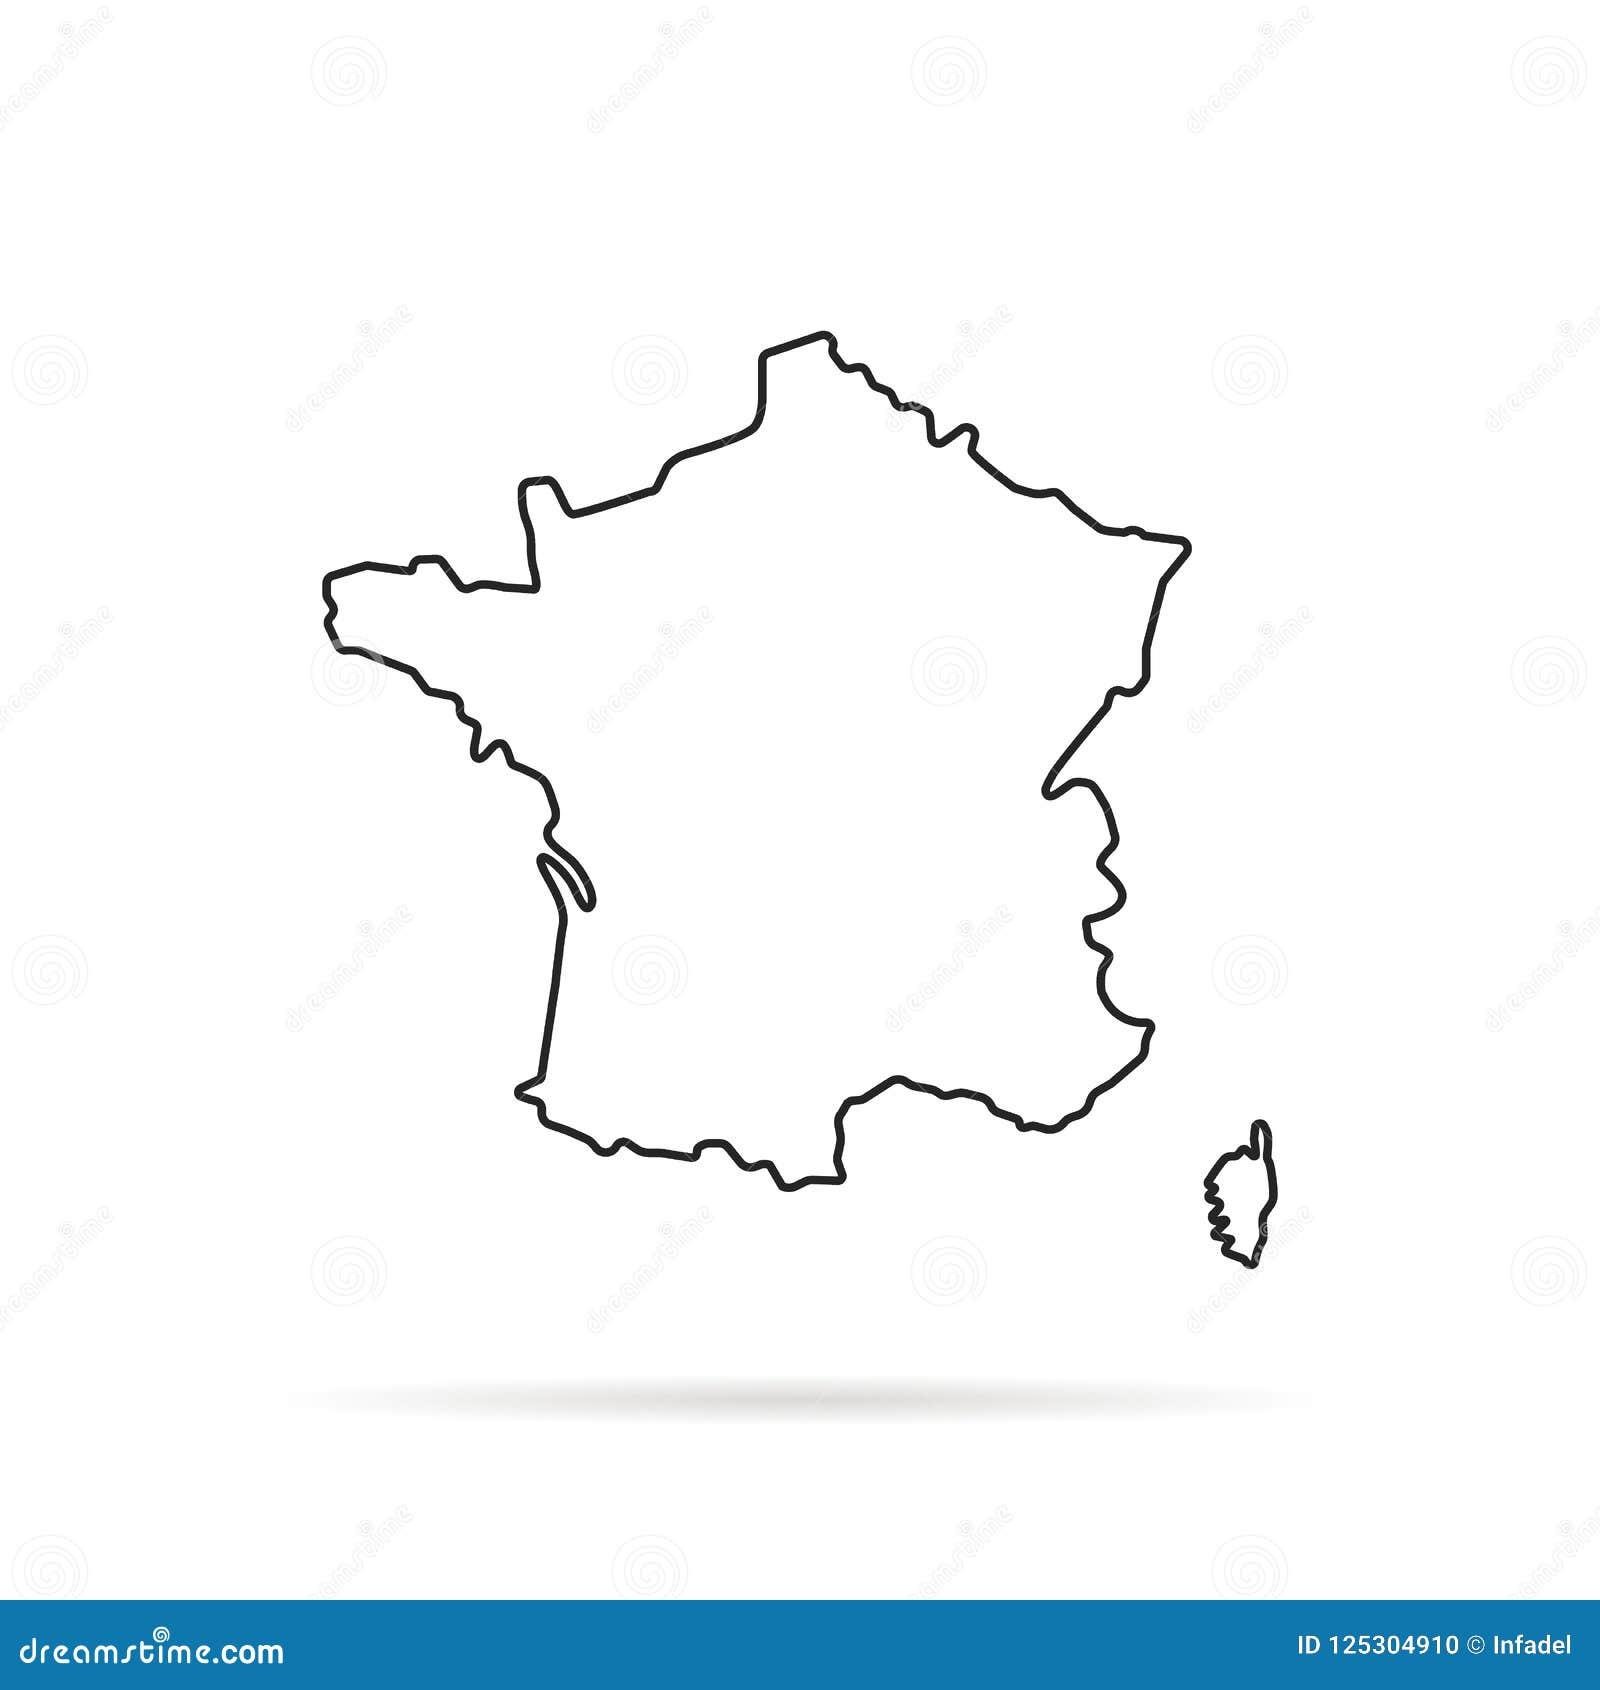 Black Outline Hand Drawn Map Of France Stock Vector   Illustration